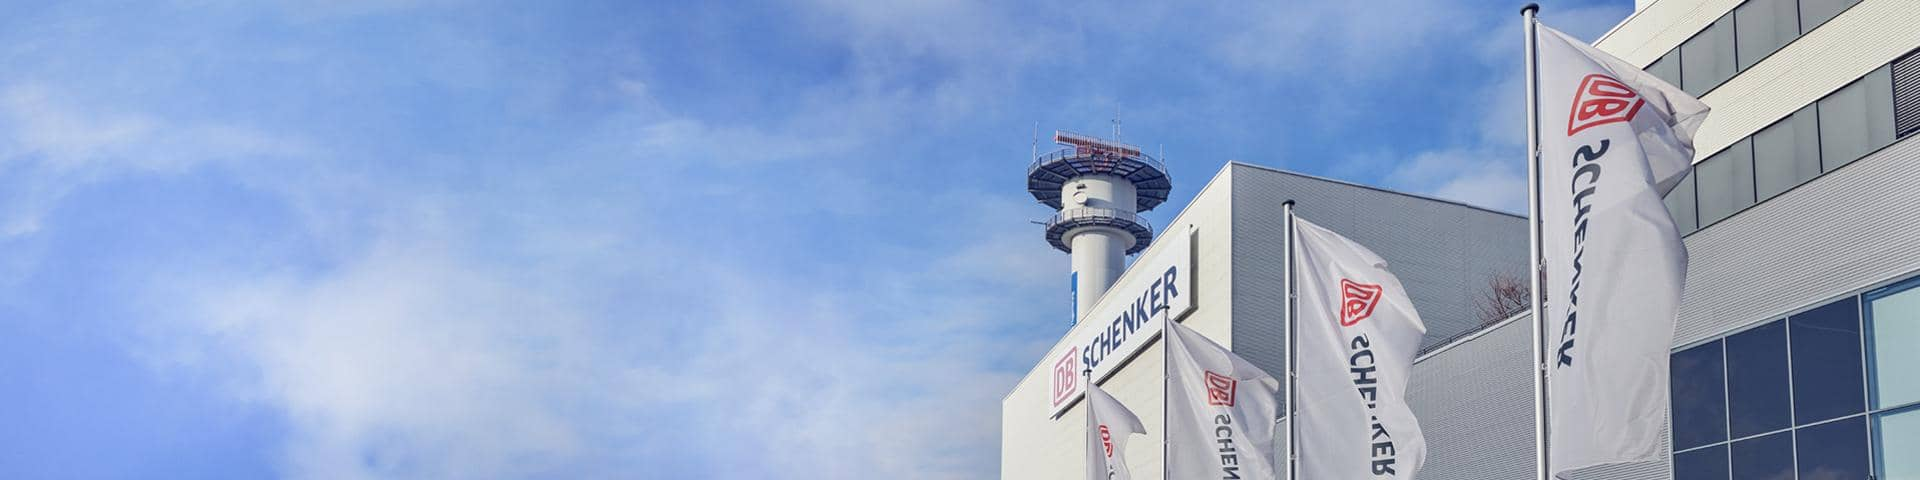 Airport DB Schenker Flags